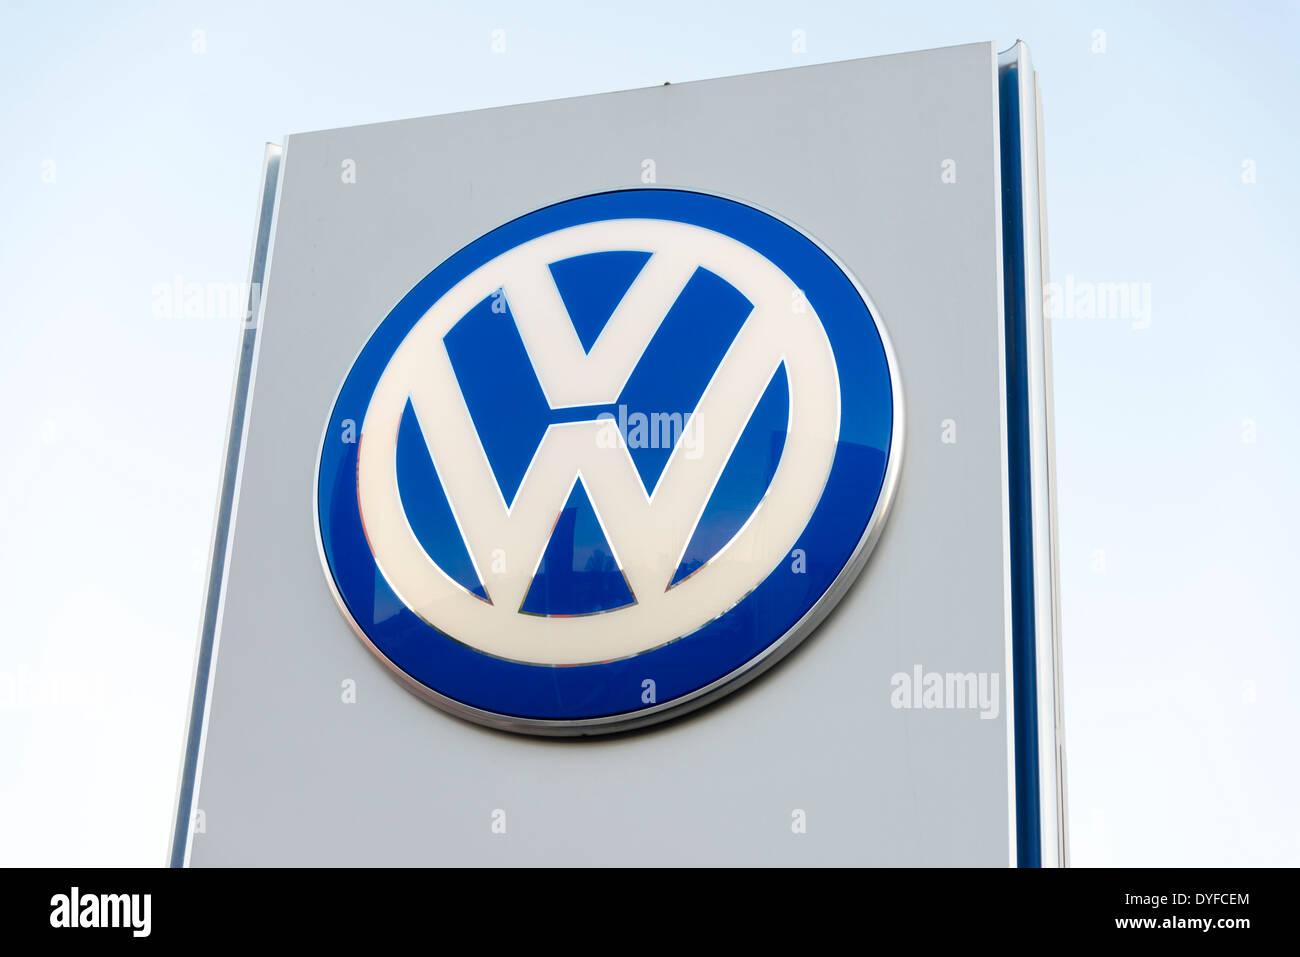 VW sign at a garage, UK. - Stock Image